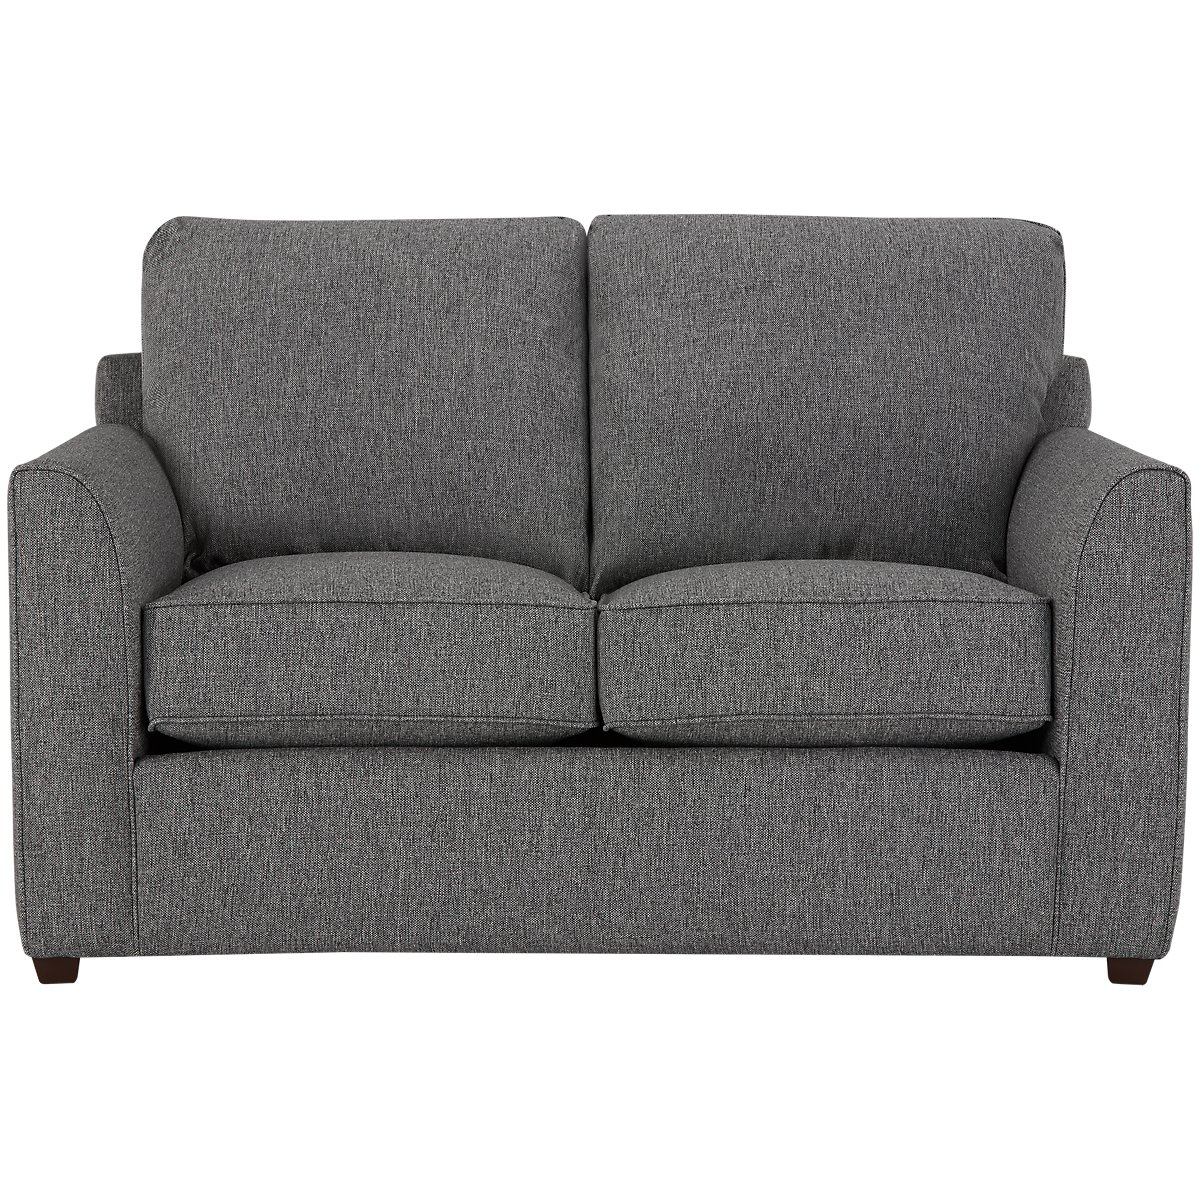 Asheville Gray Fabric Loveseat